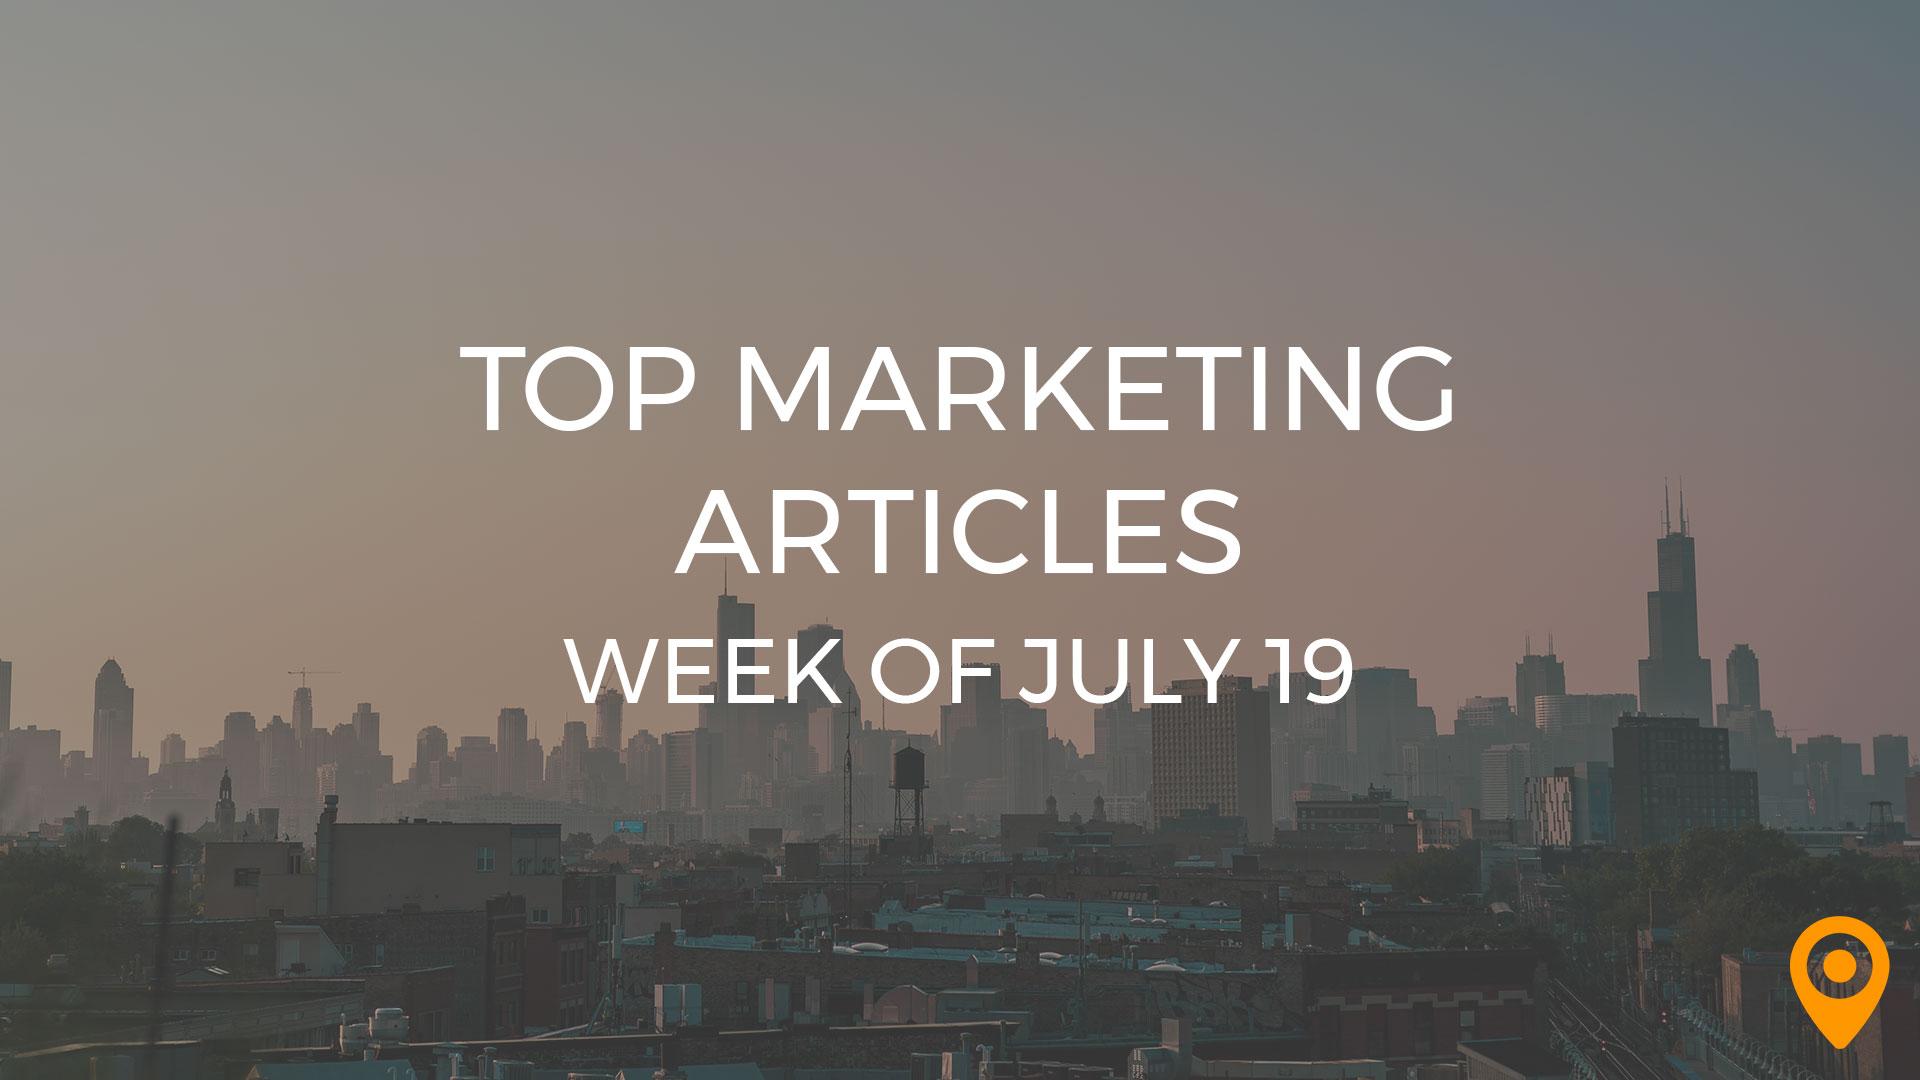 Top 25 Digital Marketing Articles – Week of 07/19/19 | UpCity